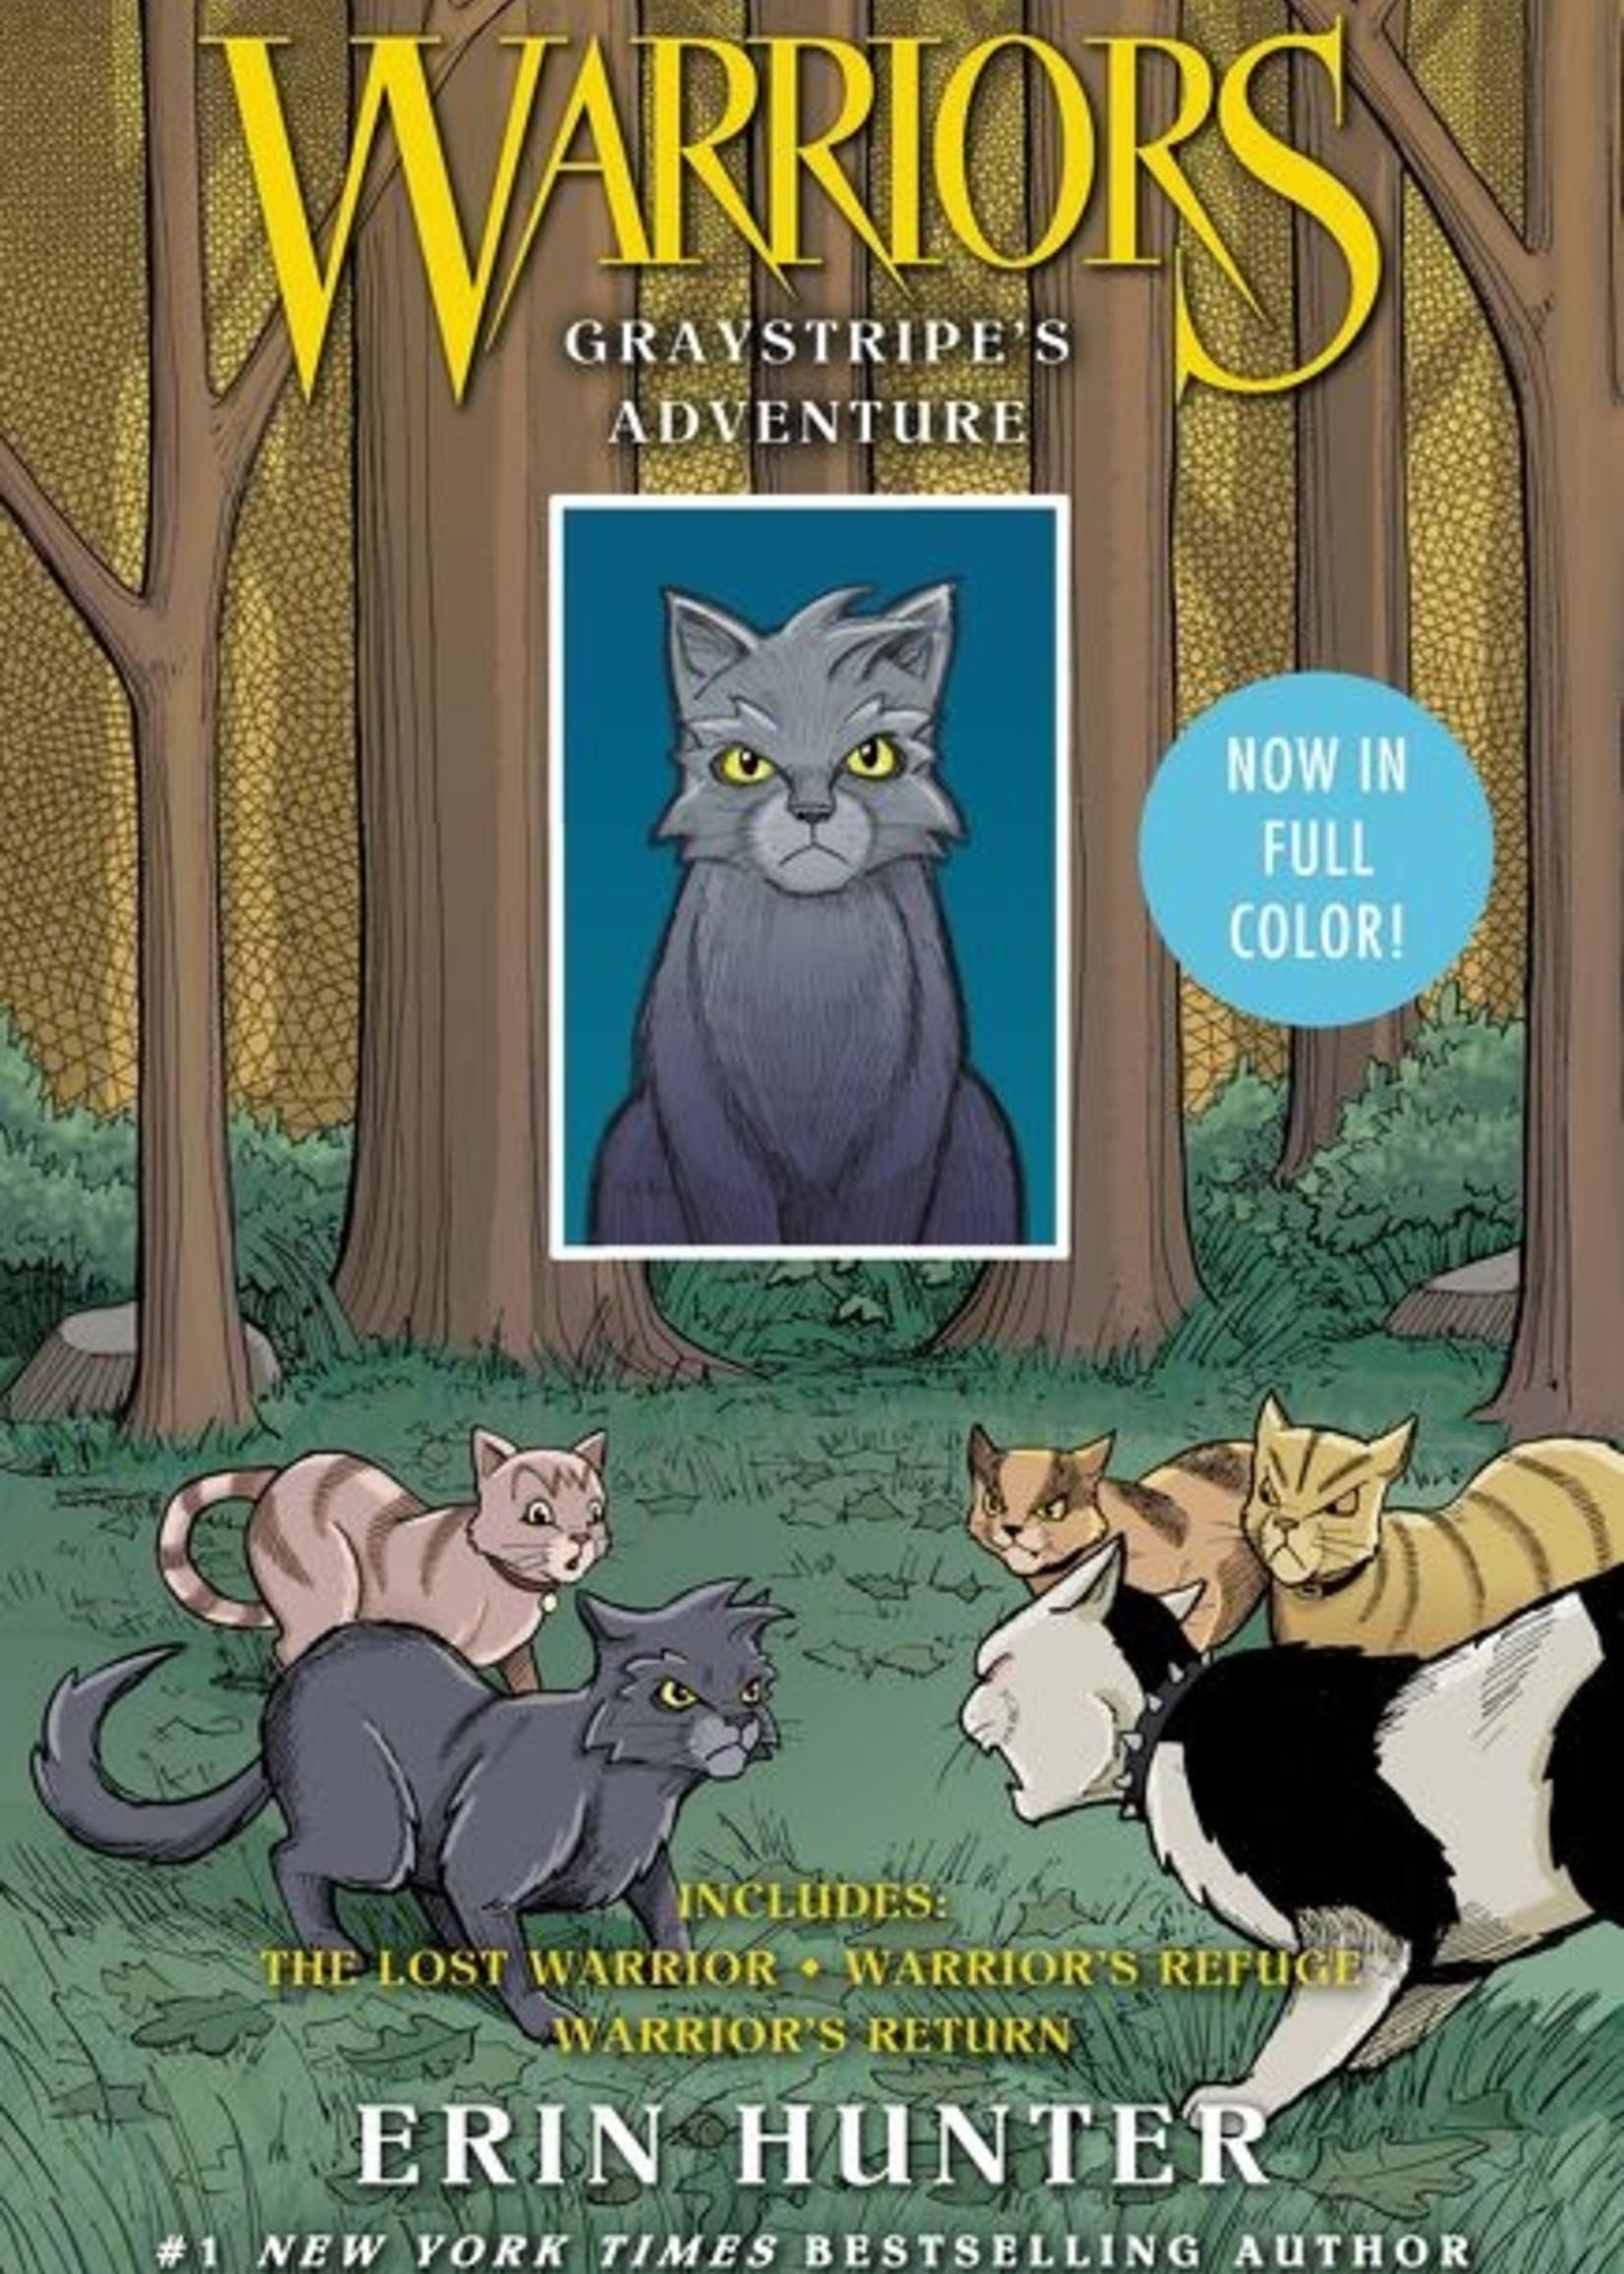 Warriors, Graystripe's Adventure Graphic Novel, The Lost Warrior, Warrior's Refuge, Warrior's Return, 3 Books in One - Paperback